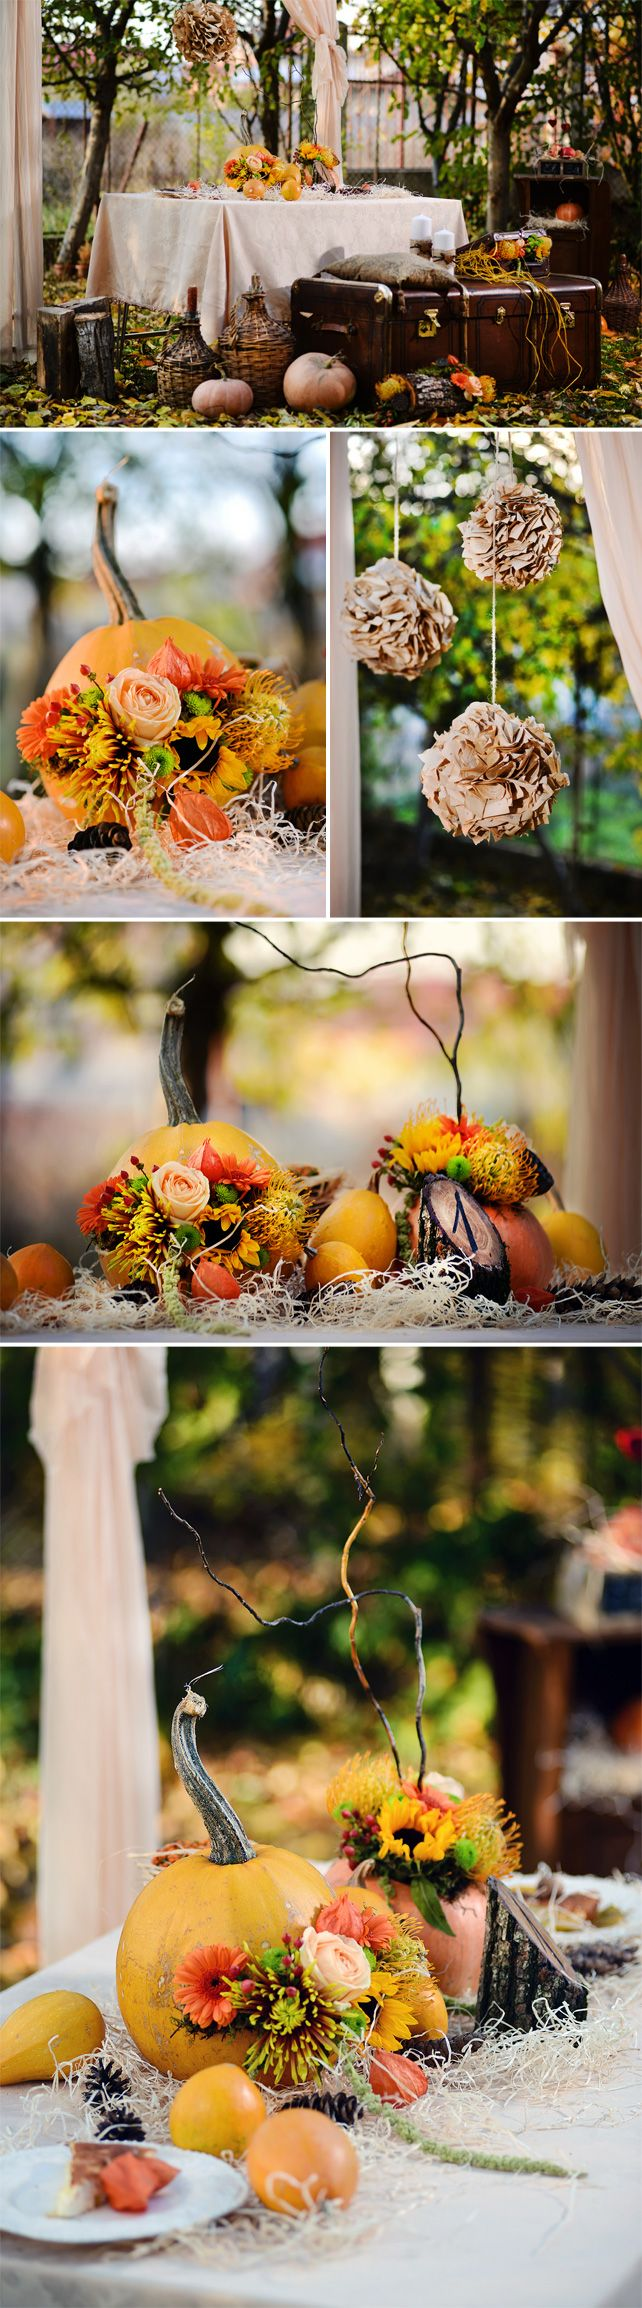 Autumn decoration ;;) home and design ❤